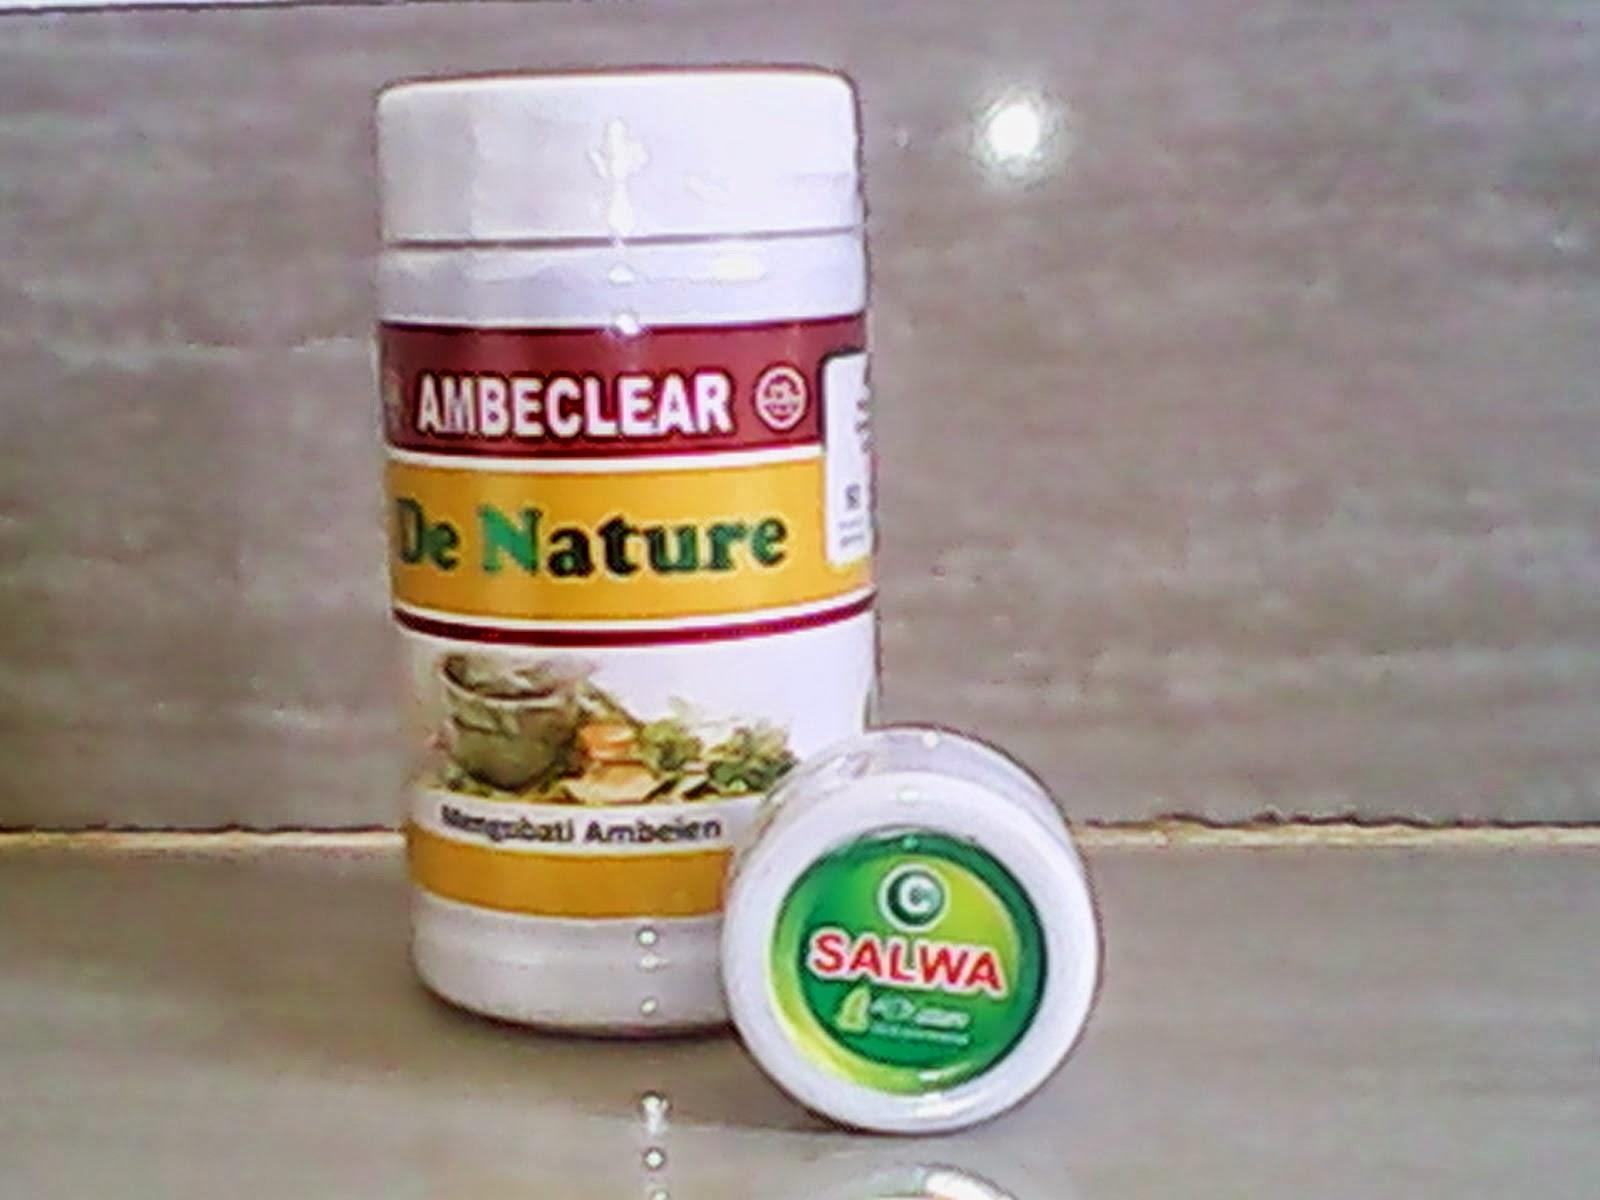 Obat Wasir Ambeclear + Salep salwa